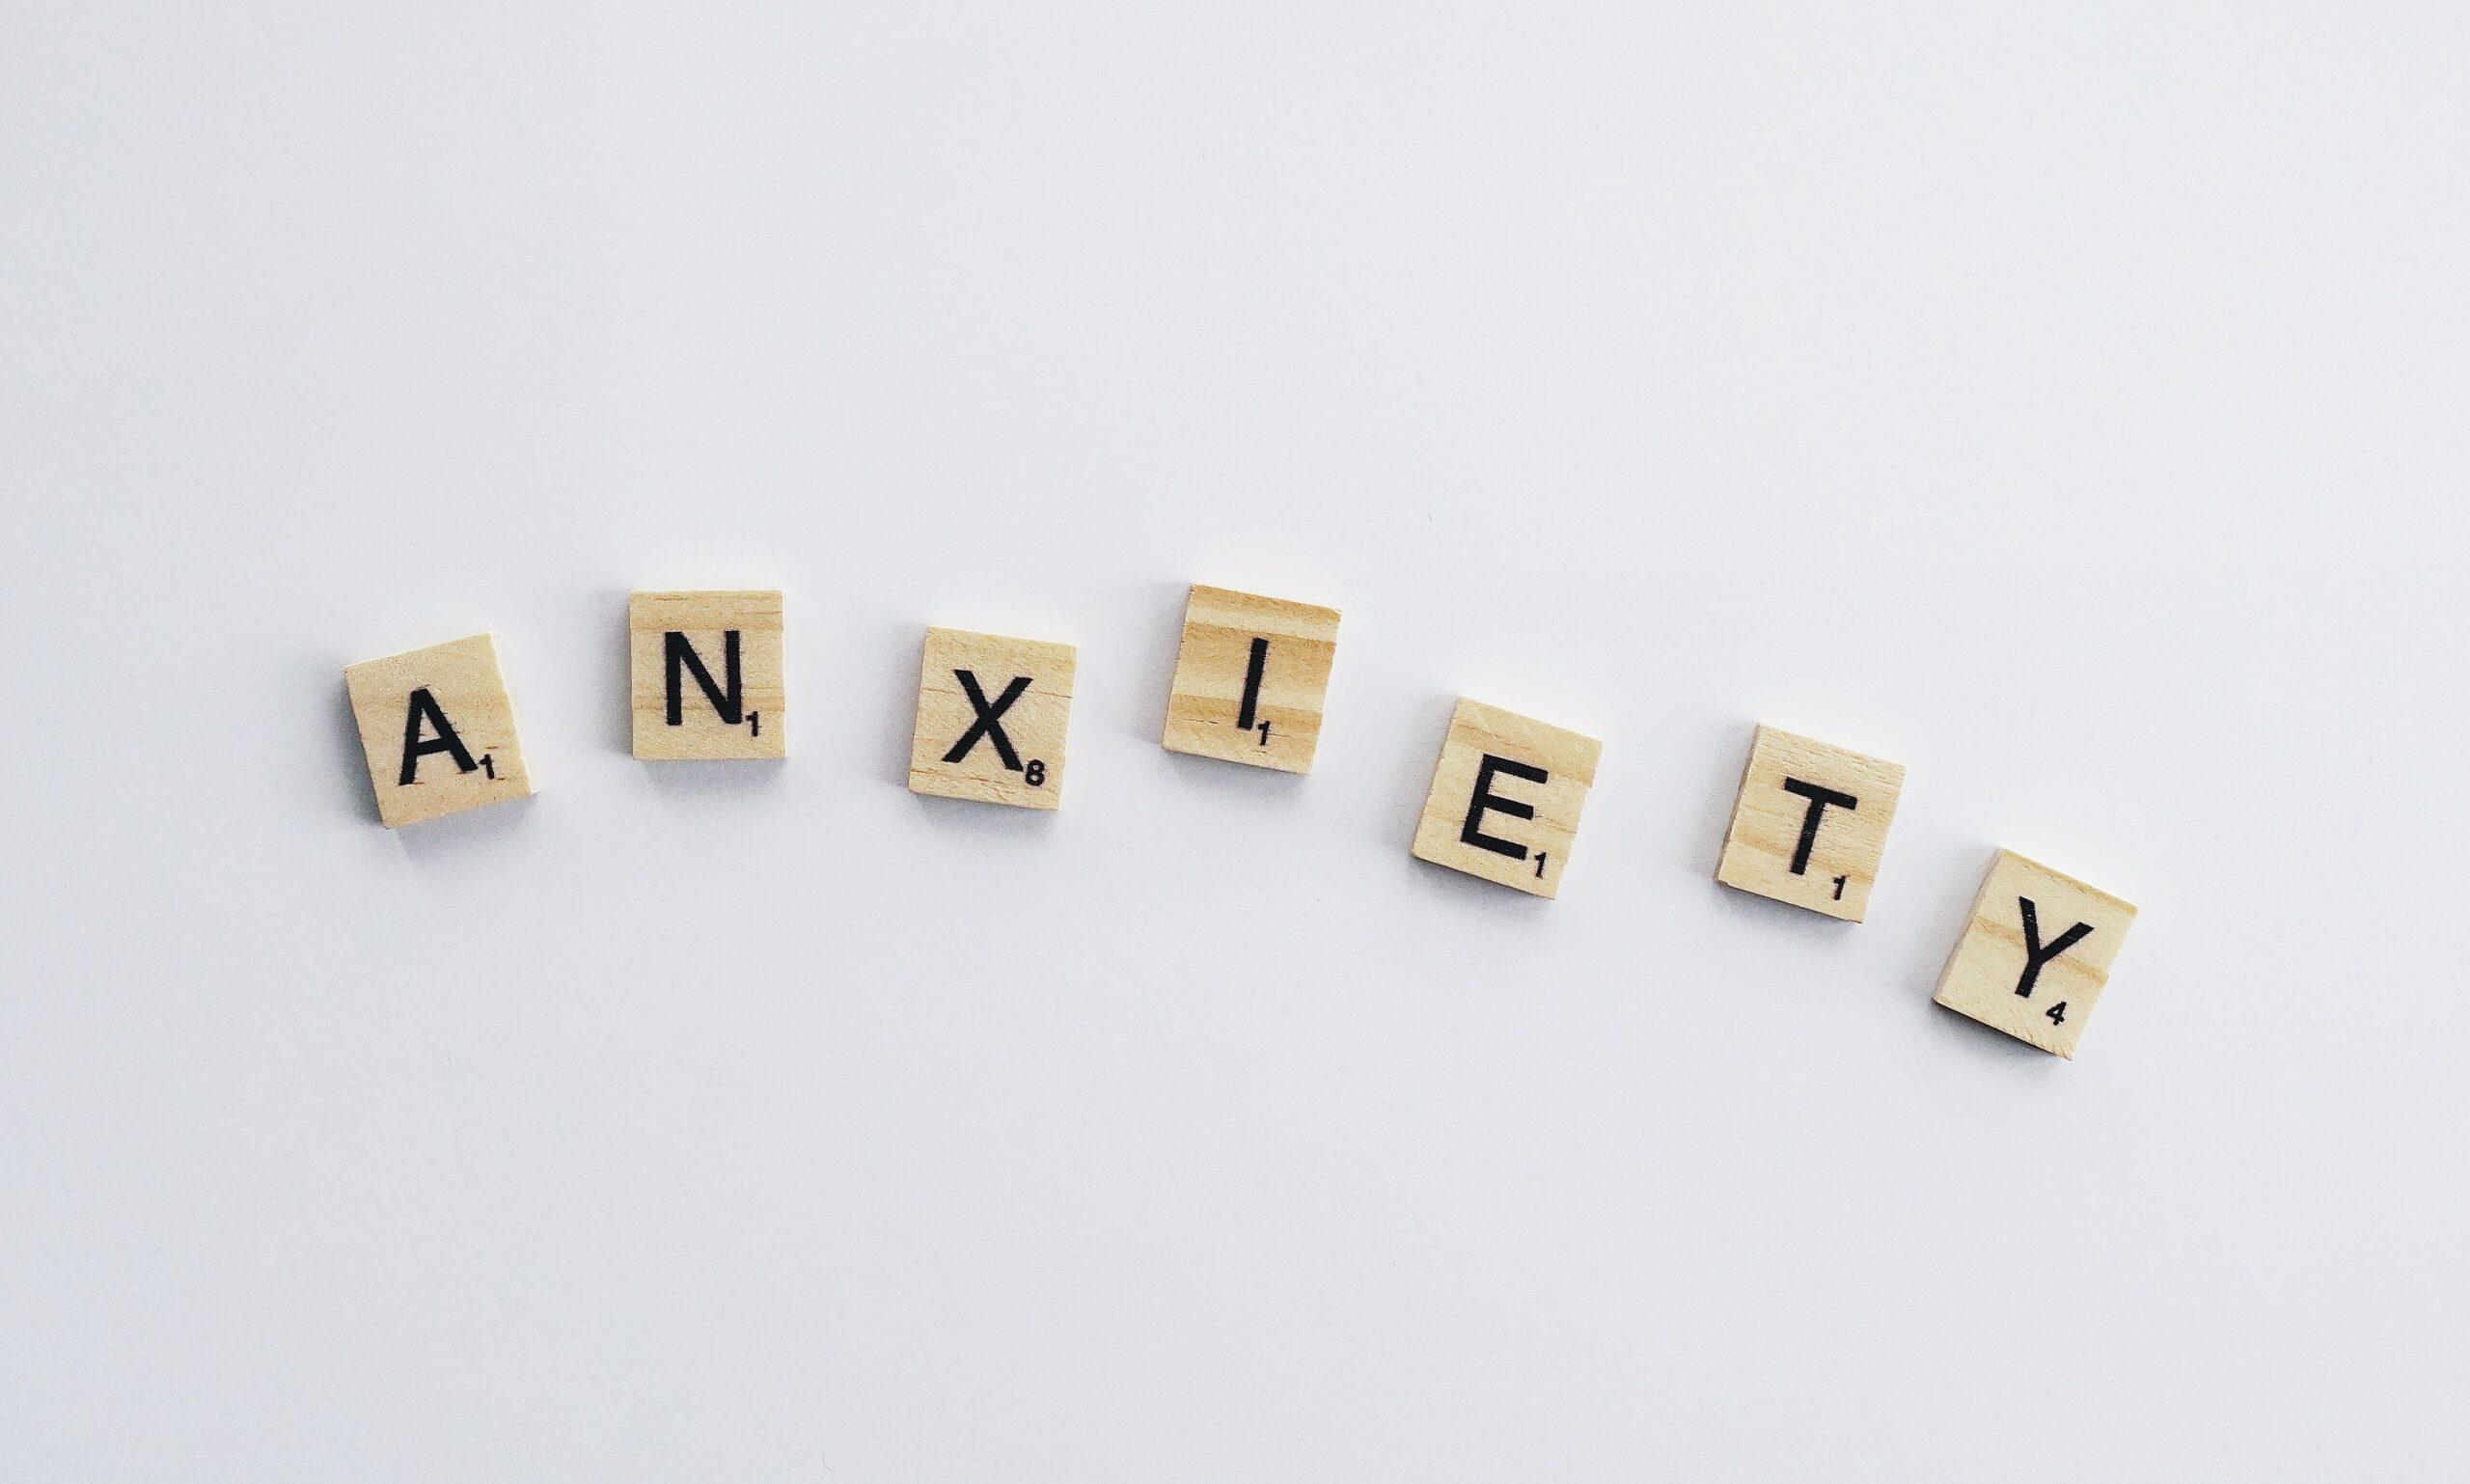 Teschers affected by anxiety